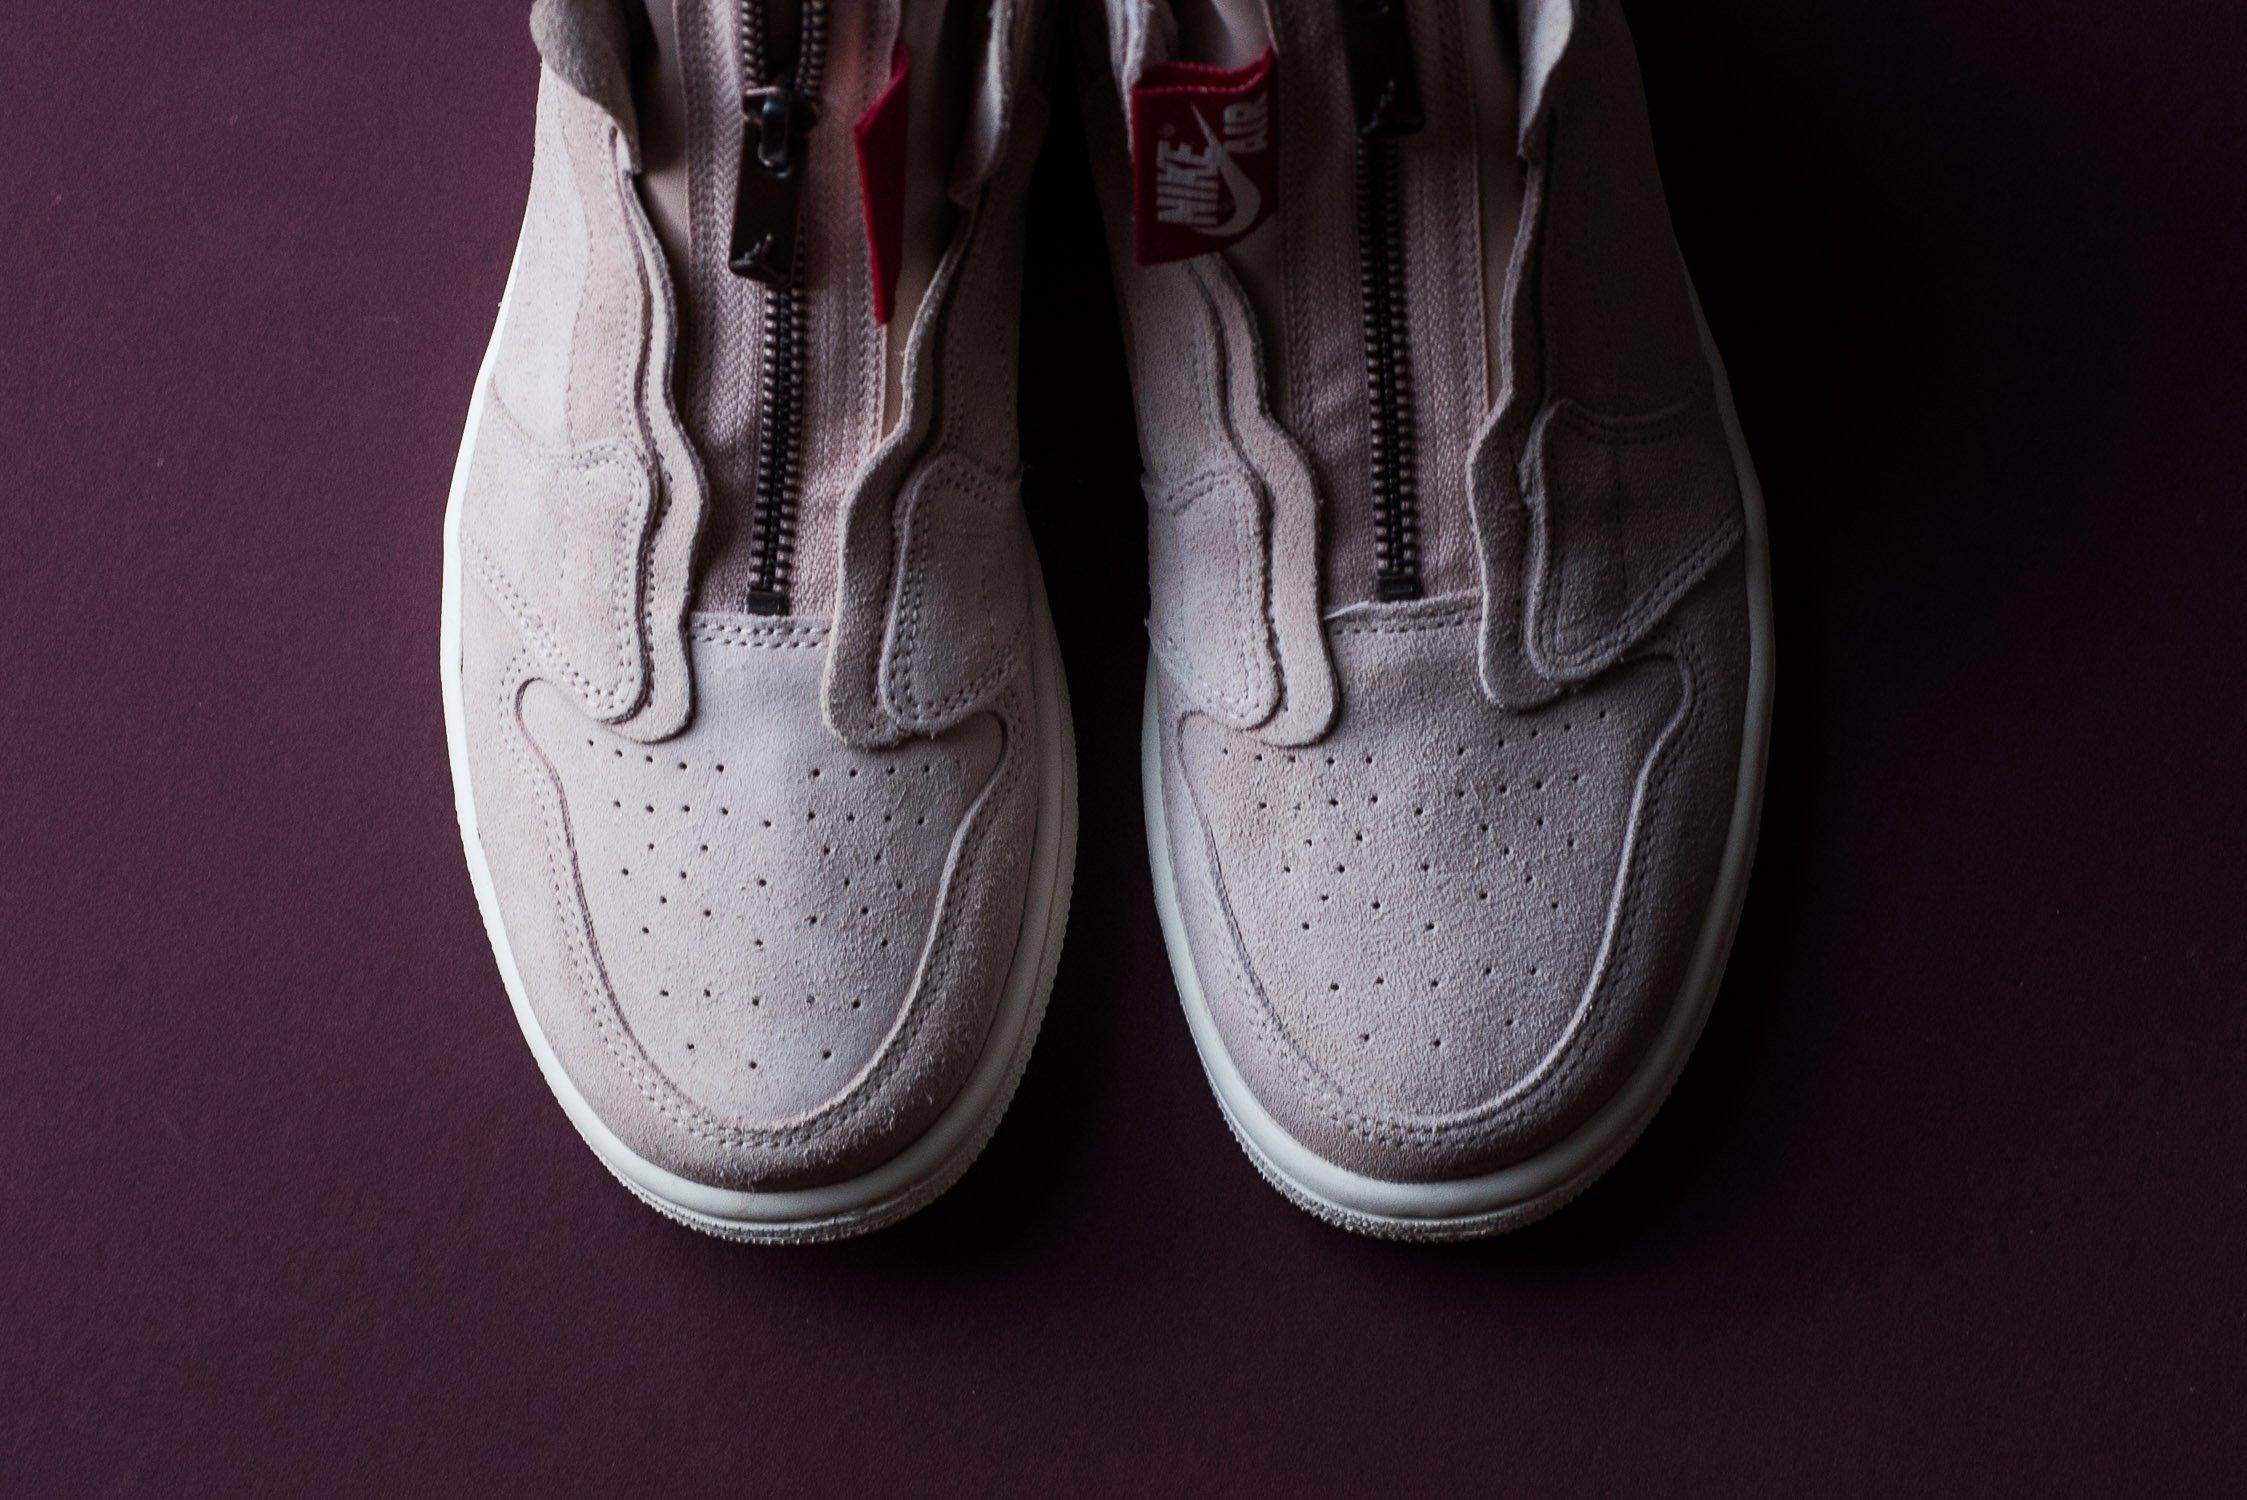 wylot nowy design nowy haj The Air Jordan 1 WMNS High Zip Particle Beige Just Released ...